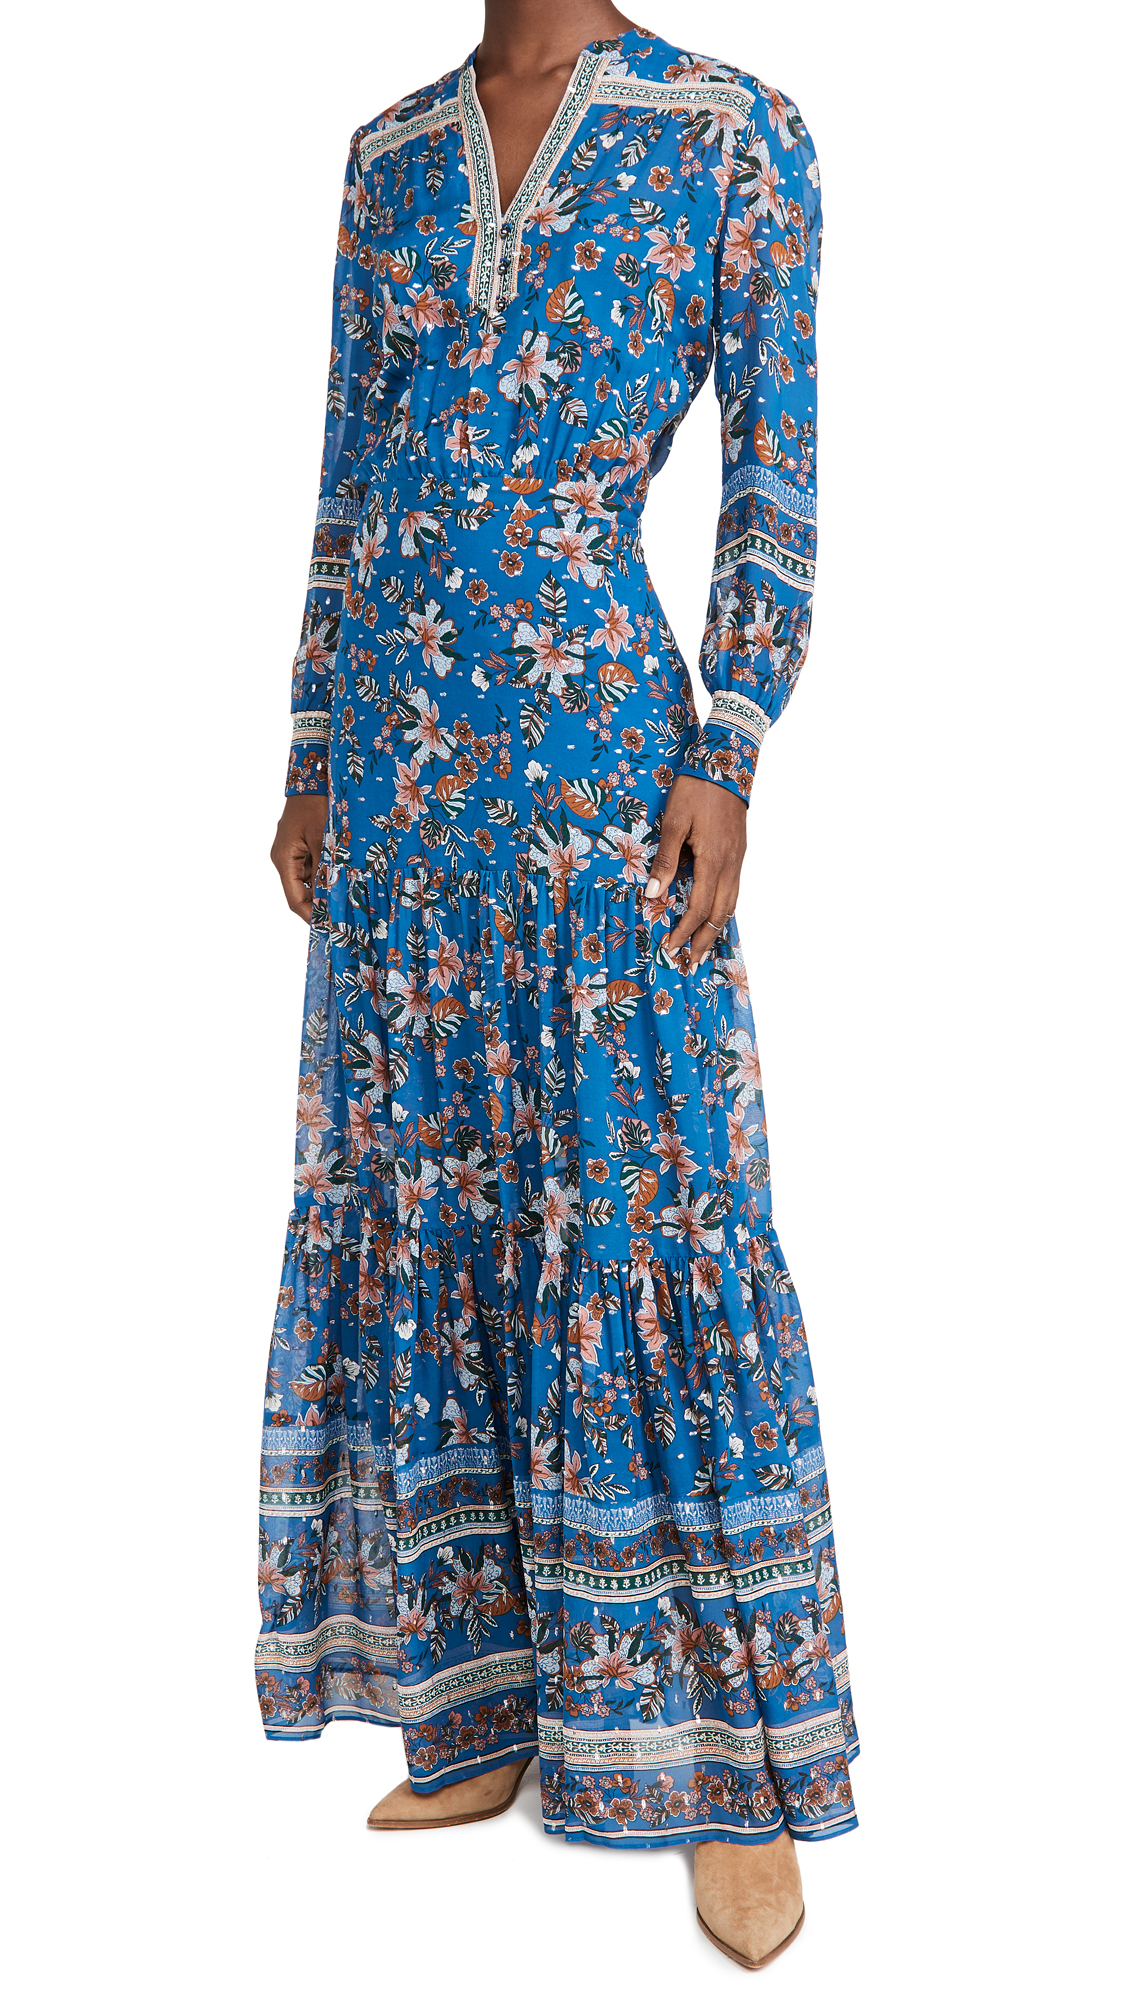 Veronica Beard Sama Dress